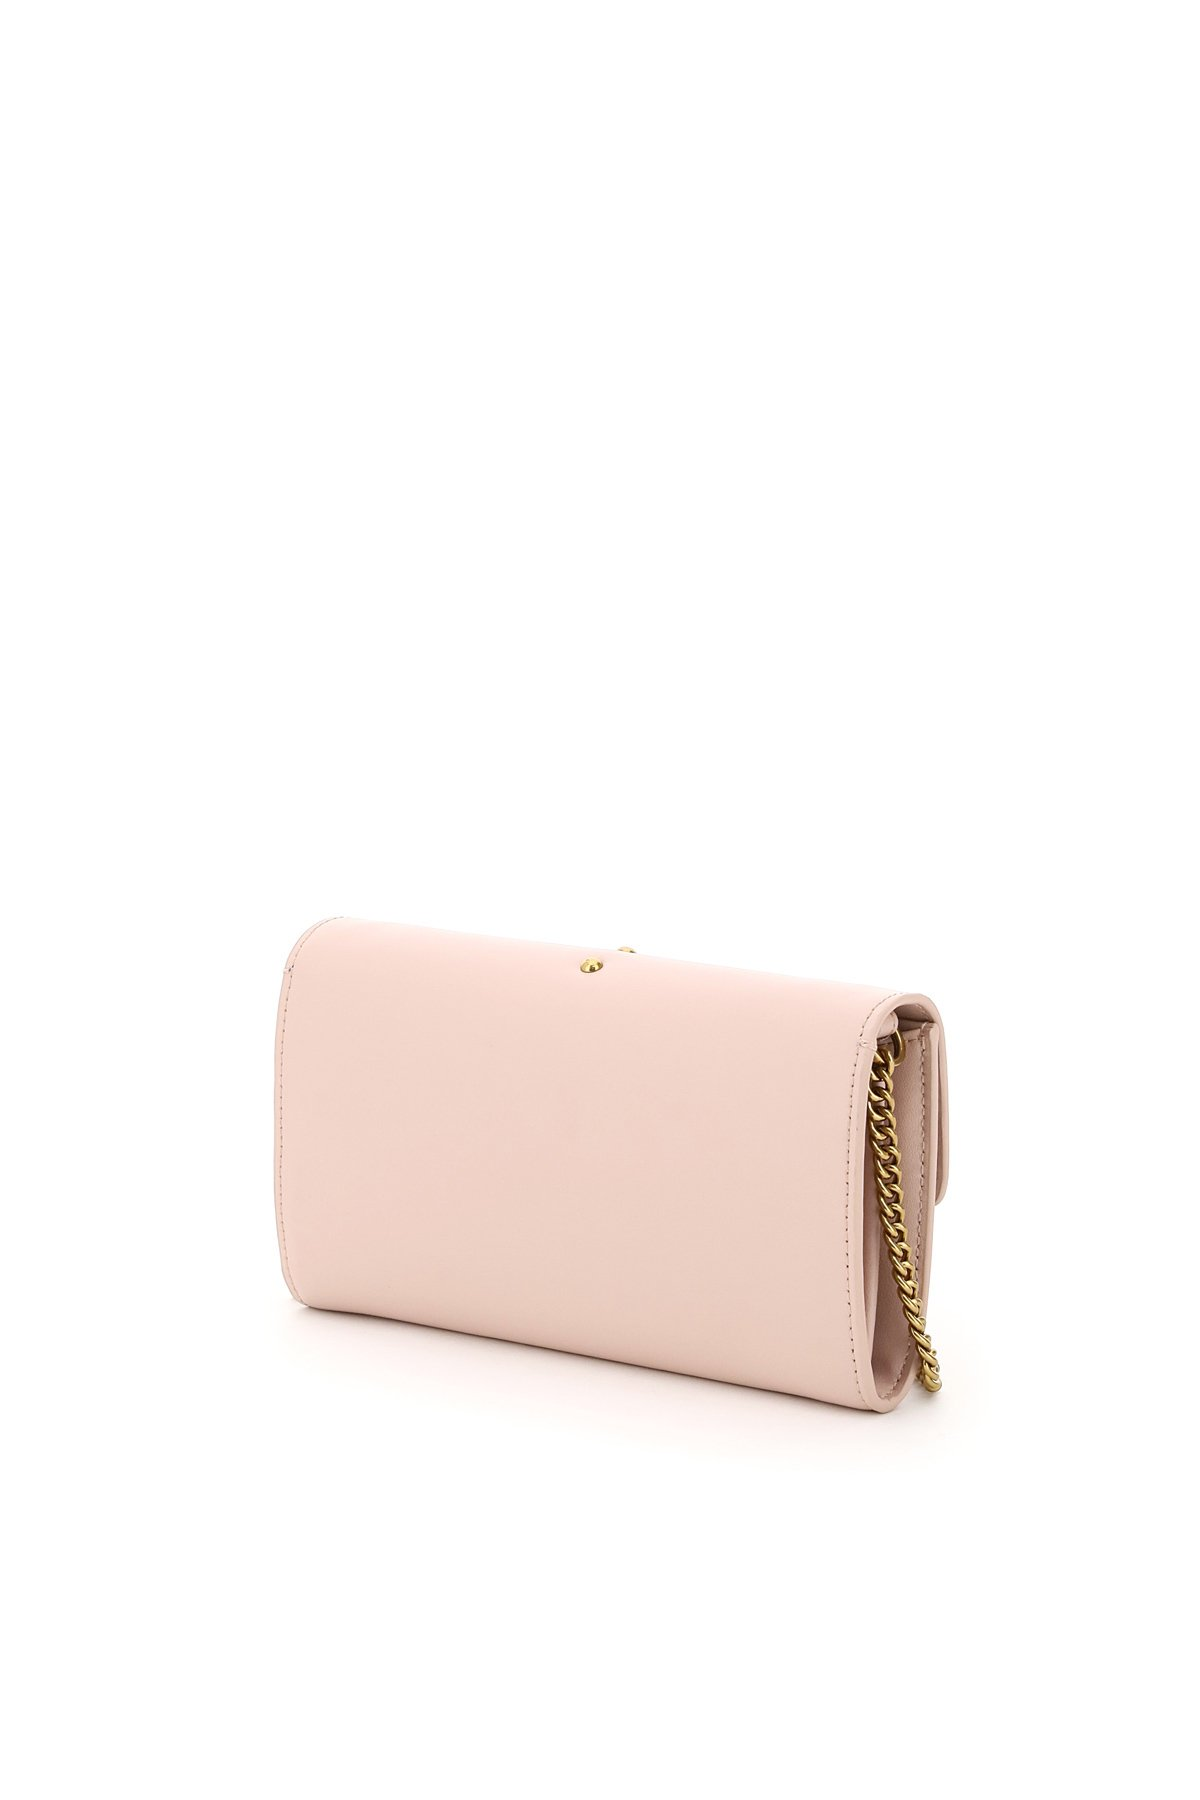 Pinko mini bag love wallet simply 3 chain